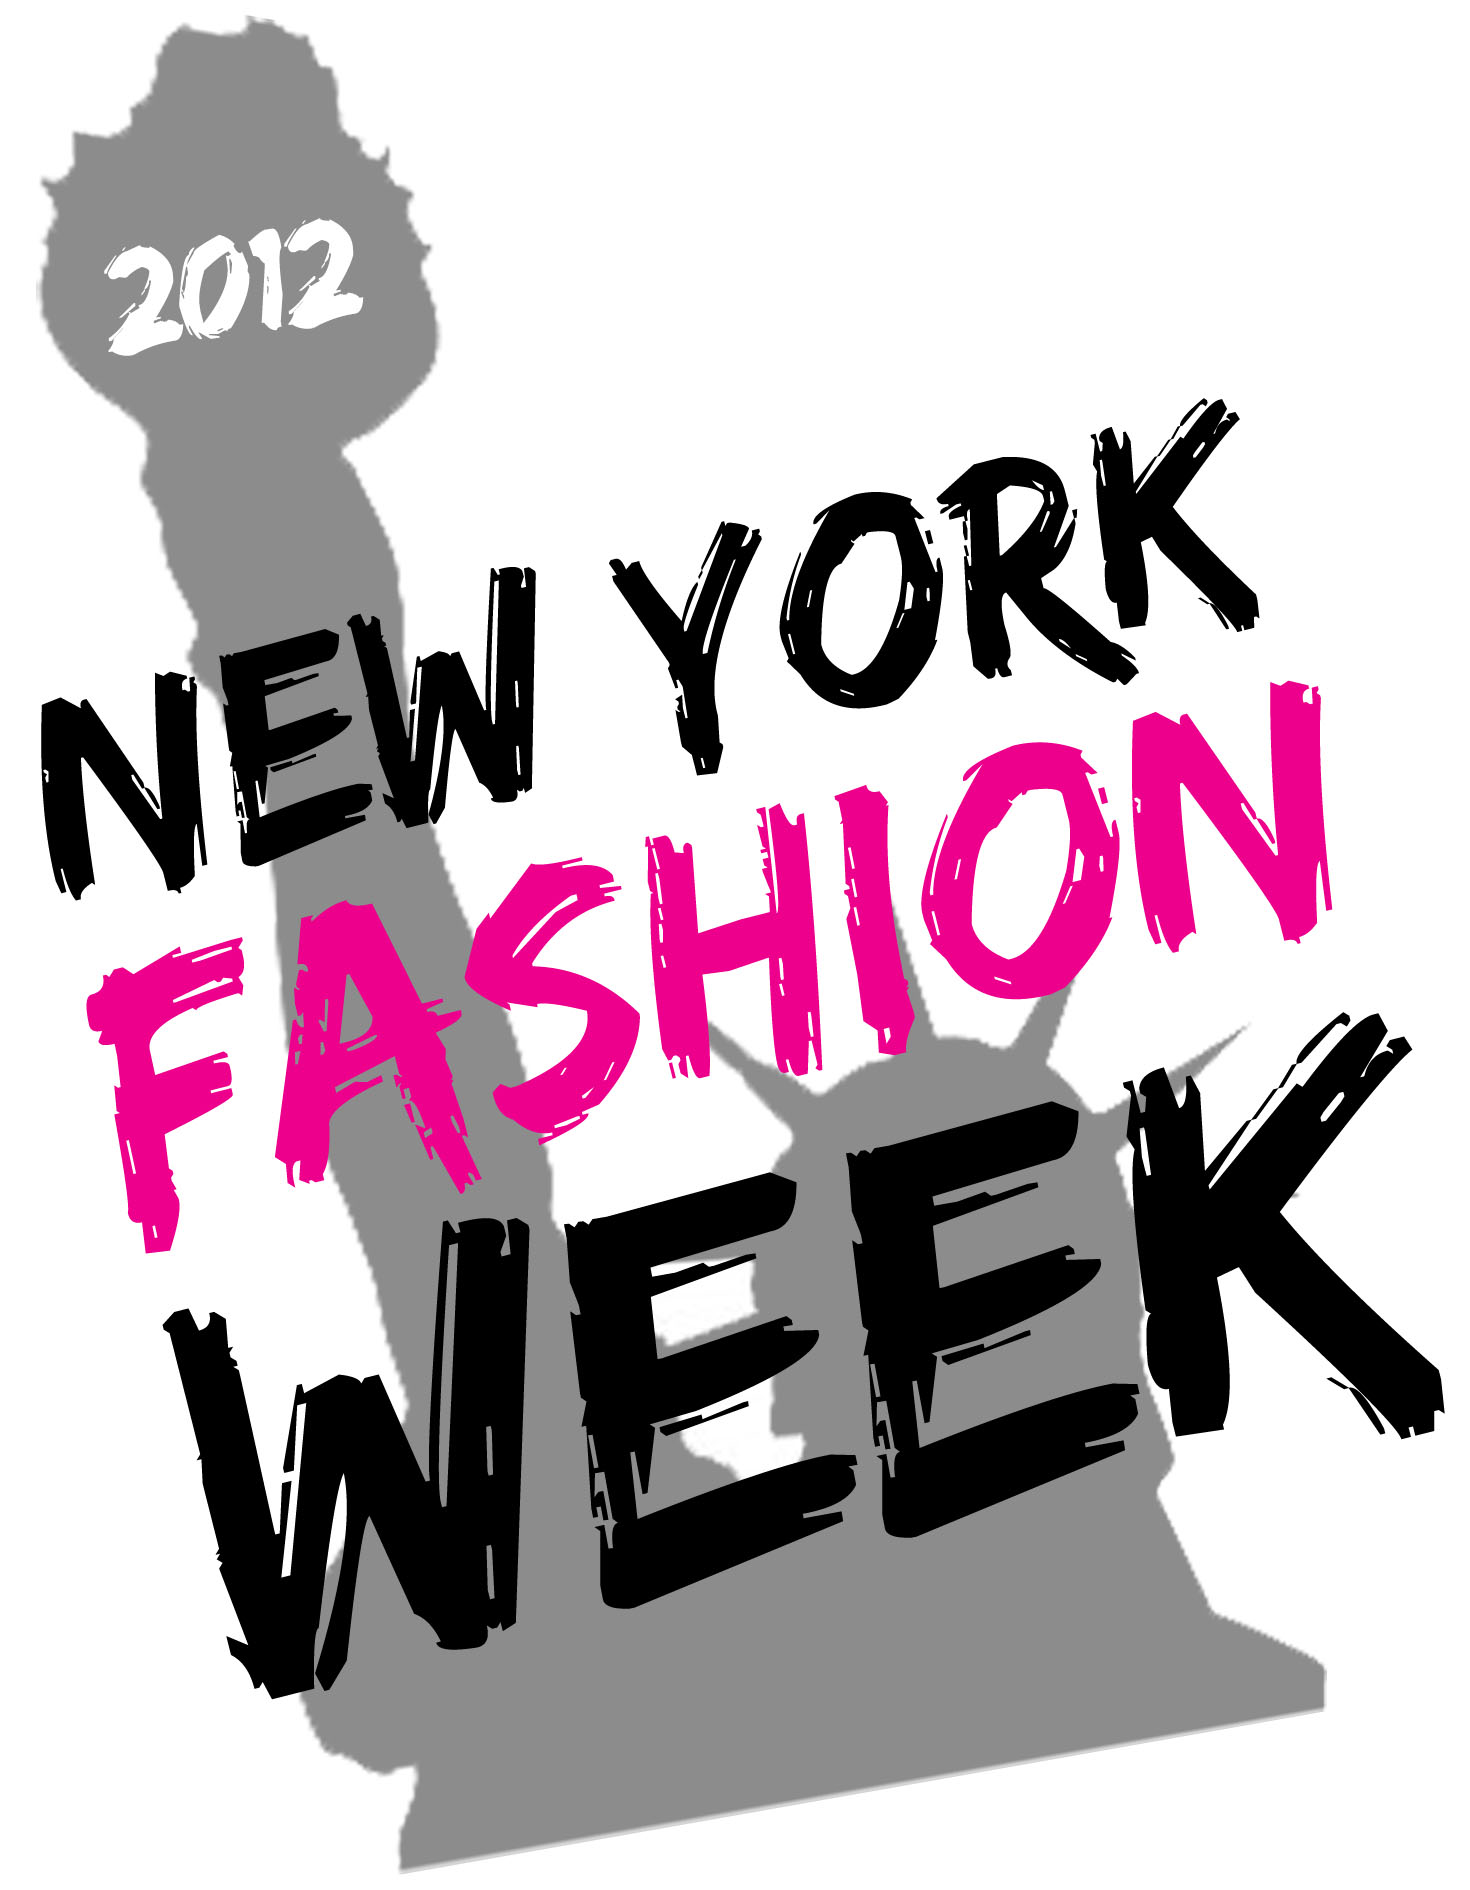 New york fashion week logo clipart clipart library stock New York Fashion Week | DV8 Modeling Agency clipart library stock